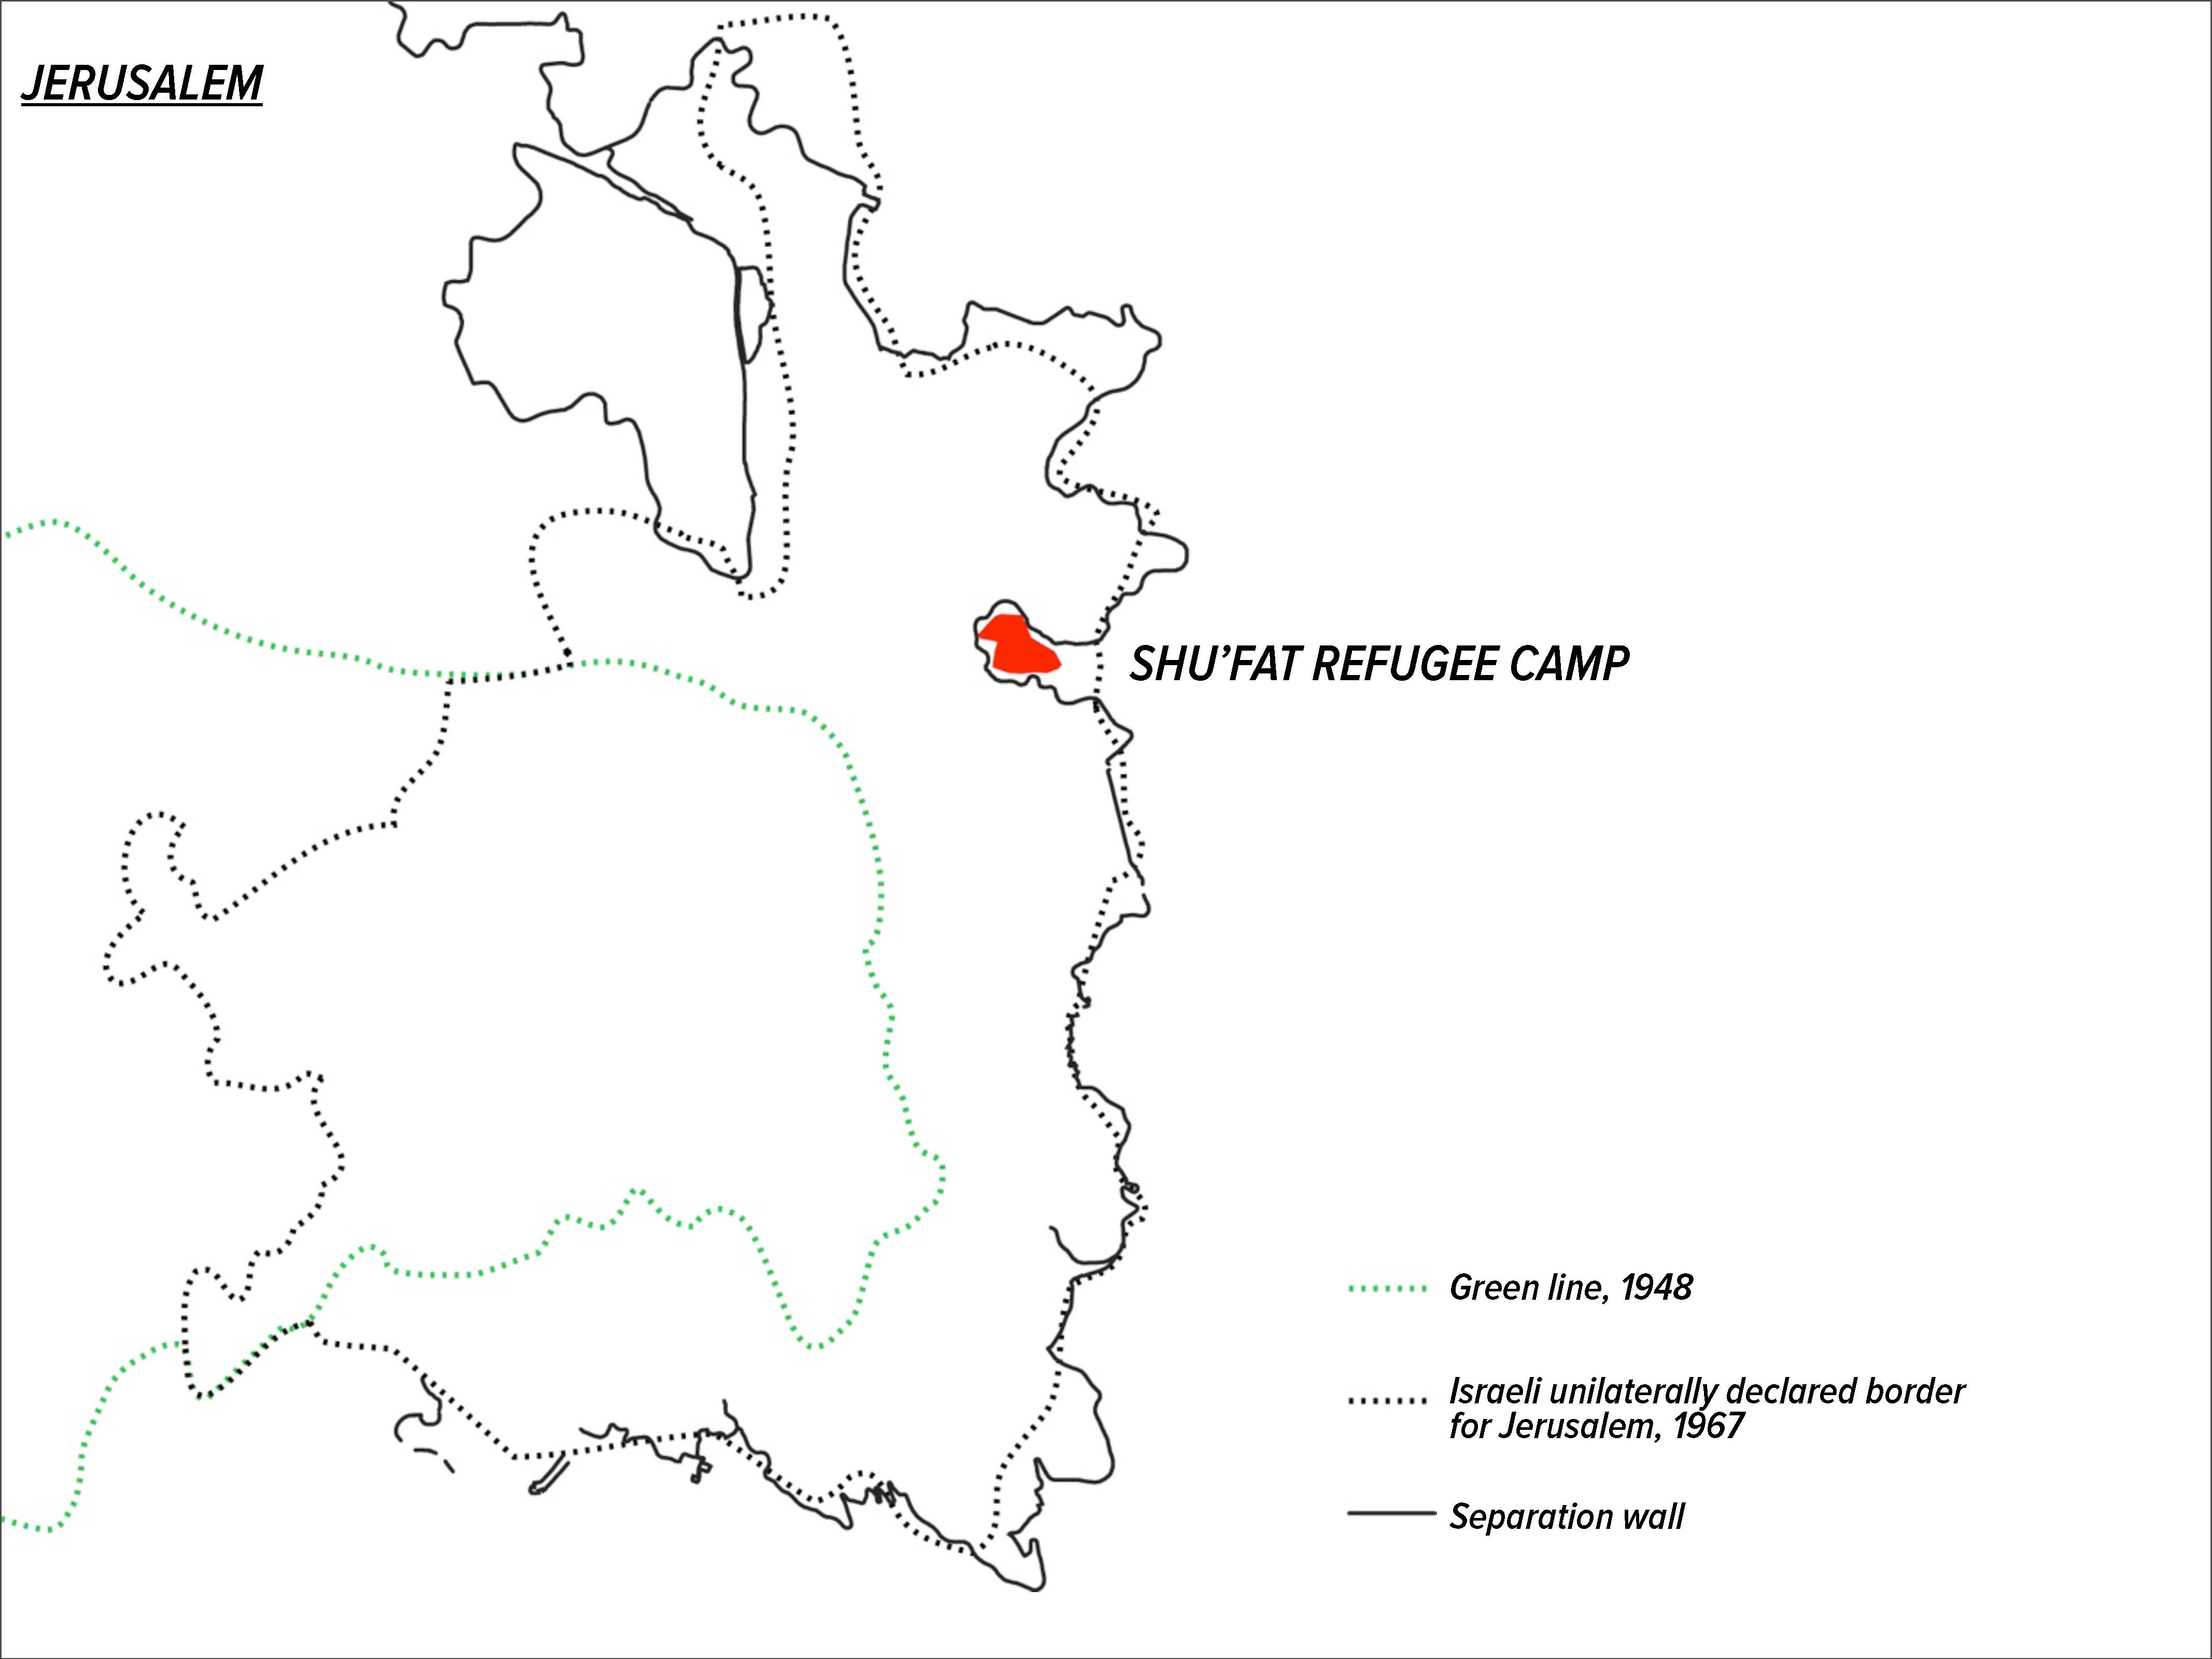 Geopolitical location of Shu'fat refugee camp